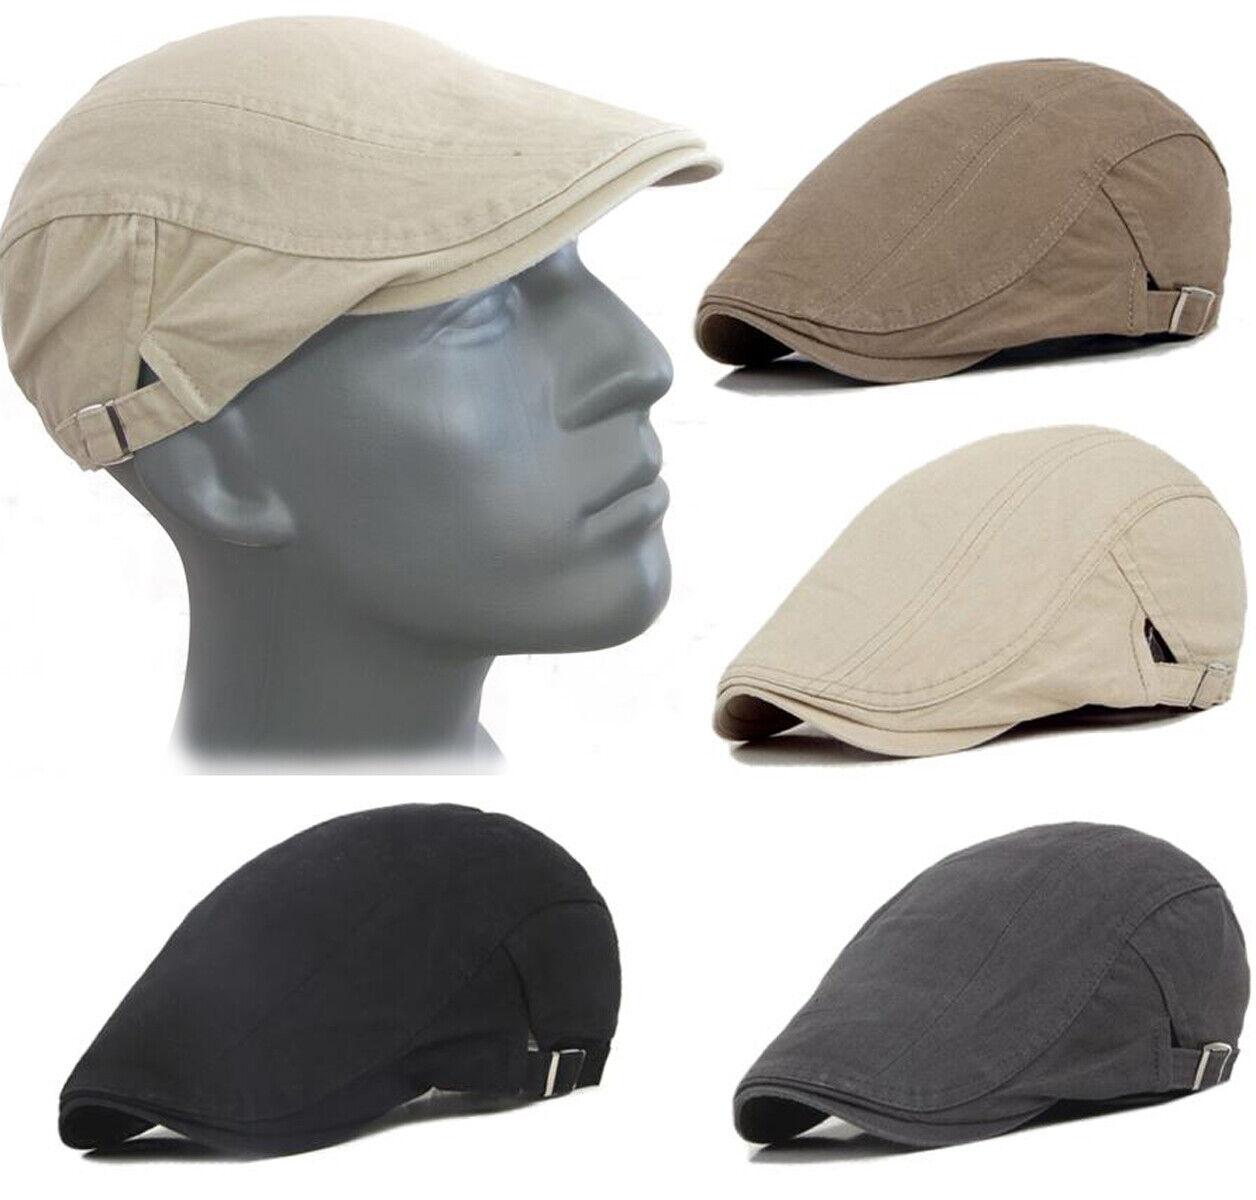 TREND Sommer Herren DRIVER CAP Schiebermütze Schirmmütze Flatcap Golfmütze NEU